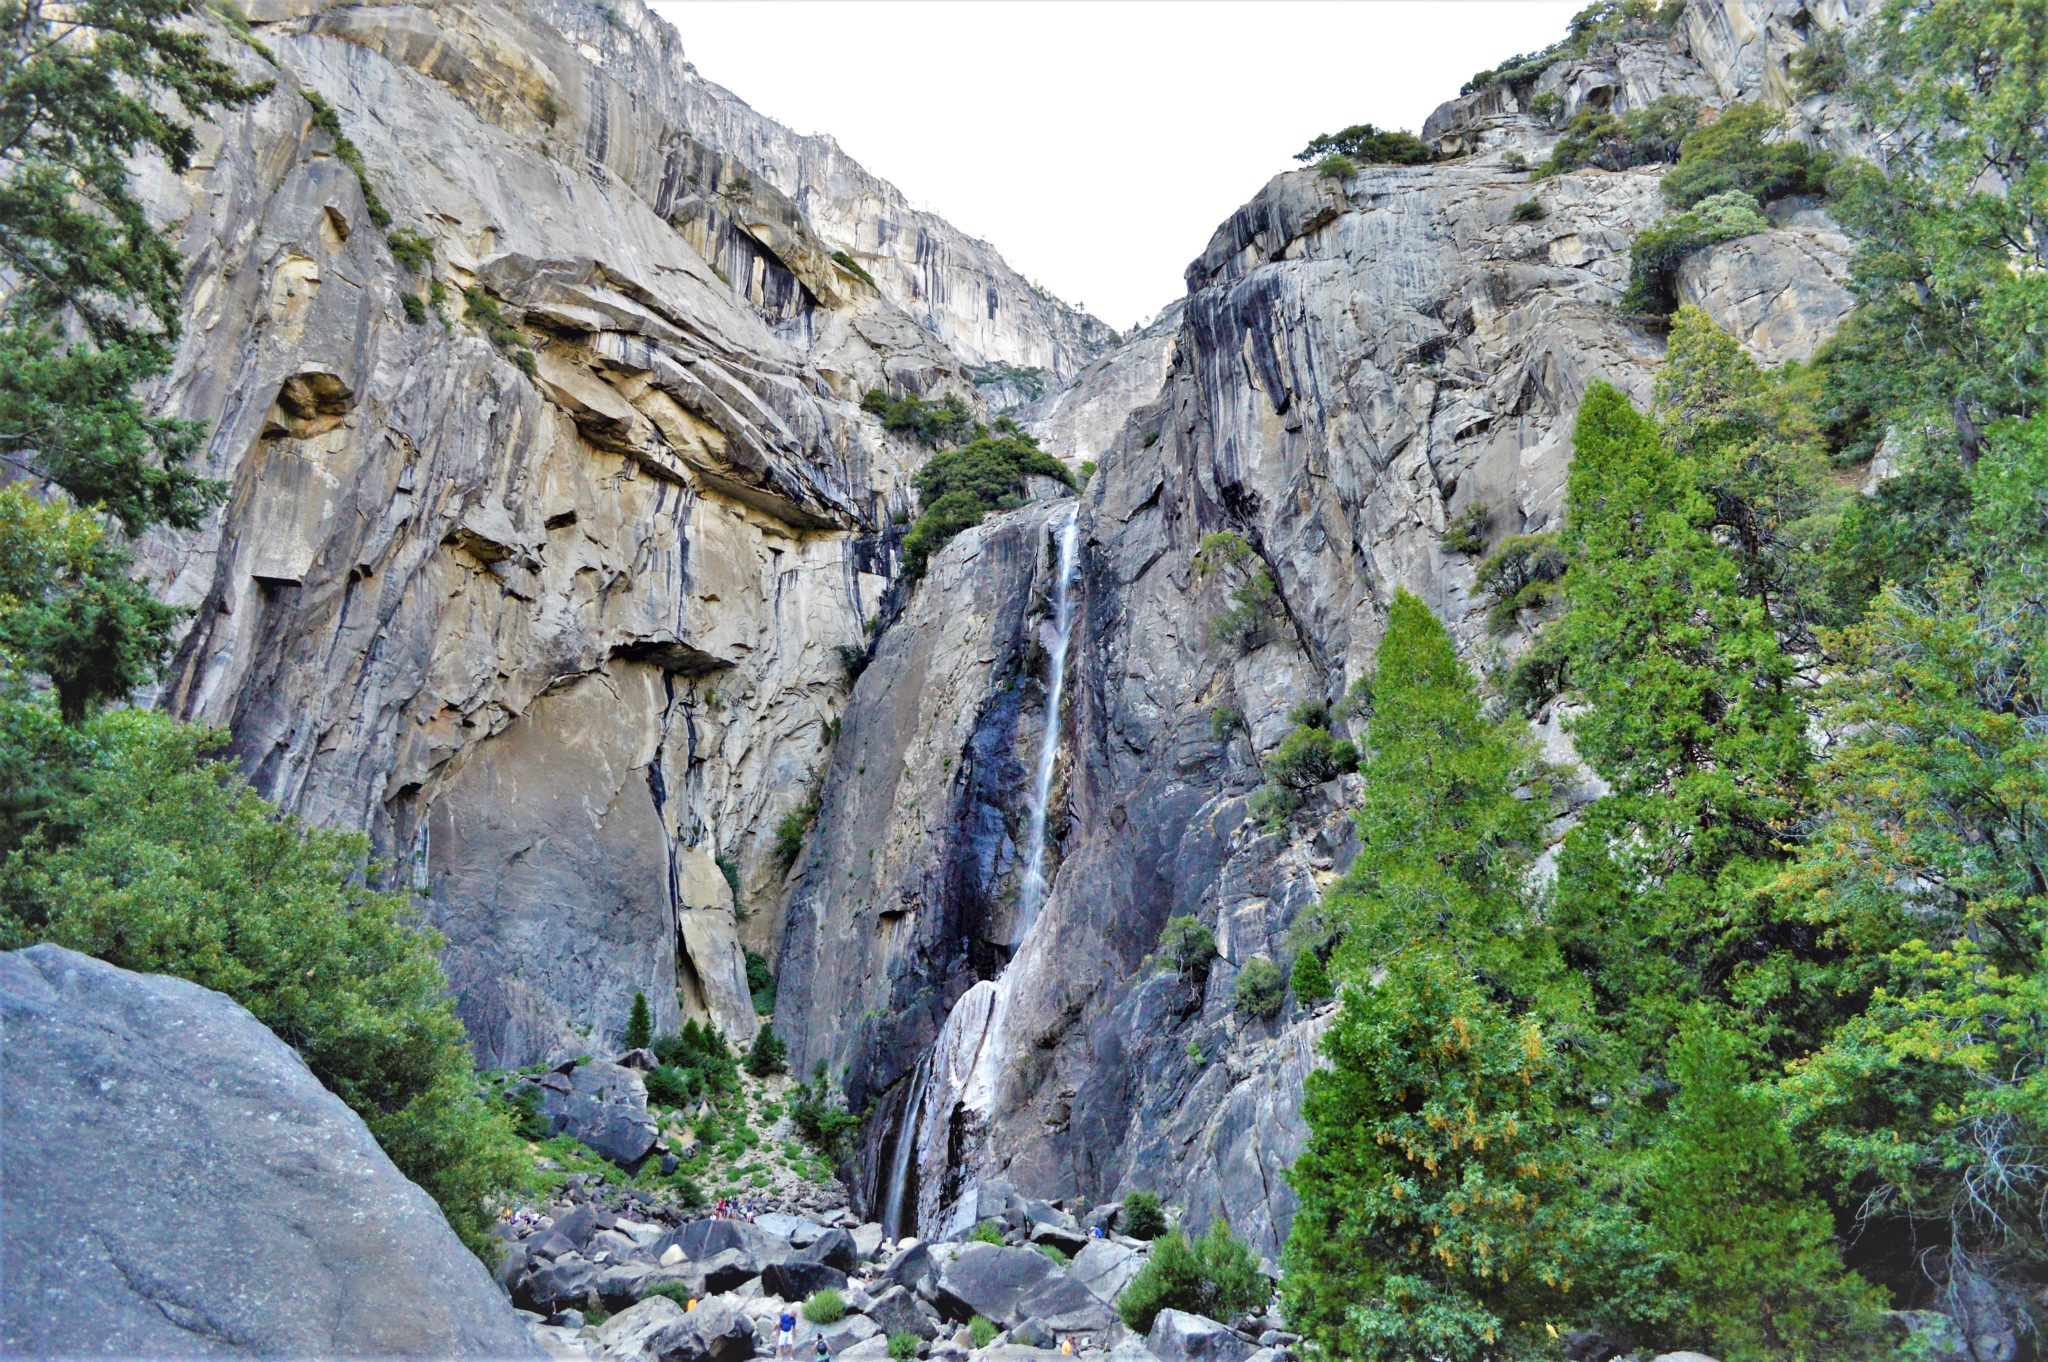 Lower Yosemite Falls, California, USA